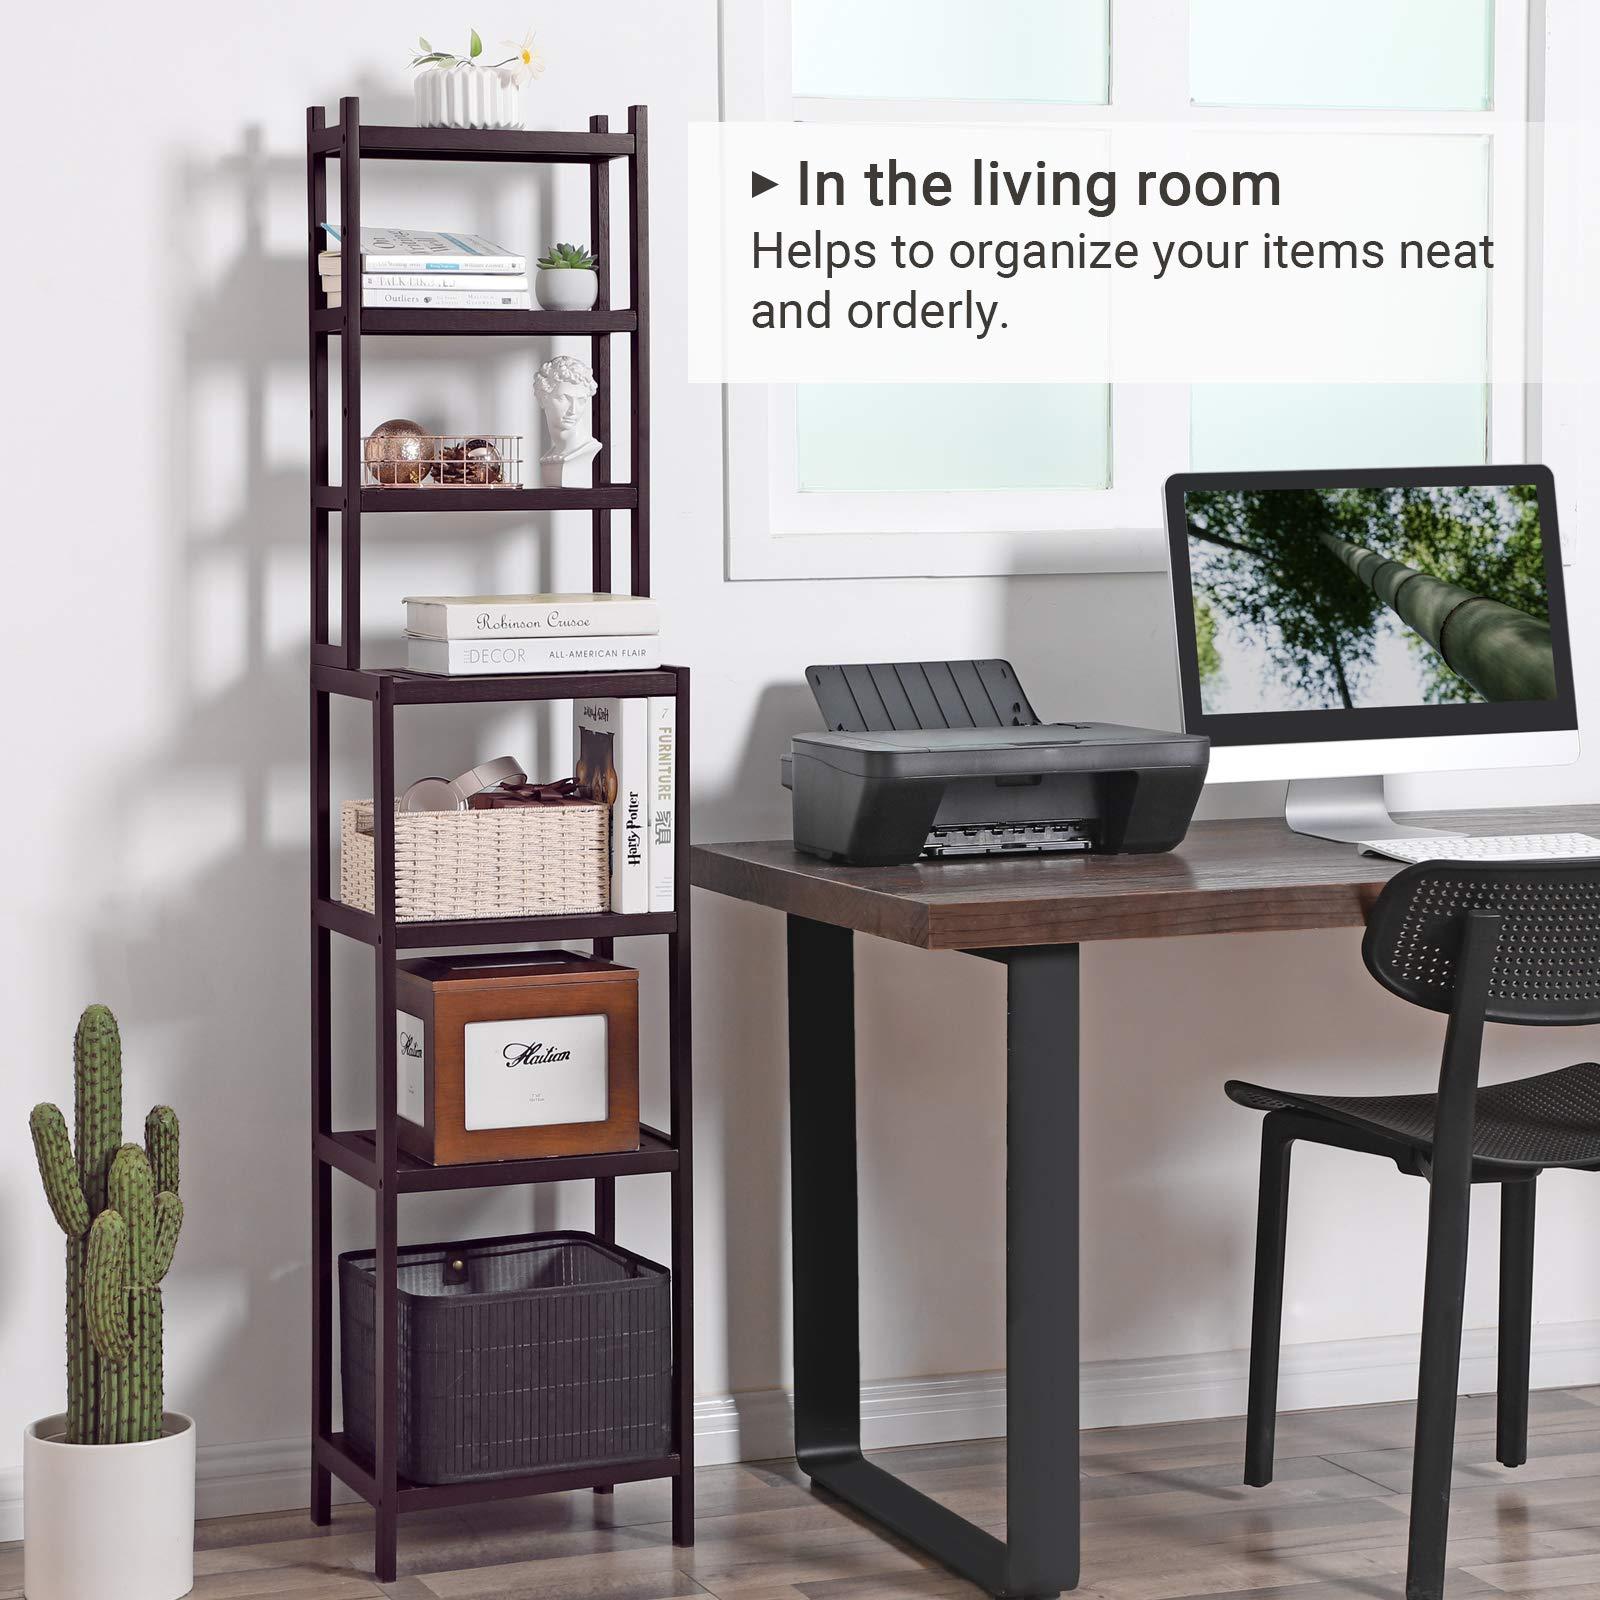 SONGMICS 7-Tier Bamboo Bathroom Shelf, 2-in-1 Design Adjustable Storage Rack, Free Standing Multifunctional Organizer, Shelving Unit for Washroom, Living Room, Kitchen, Brown UBCR01BR by SONGMICS (Image #4)